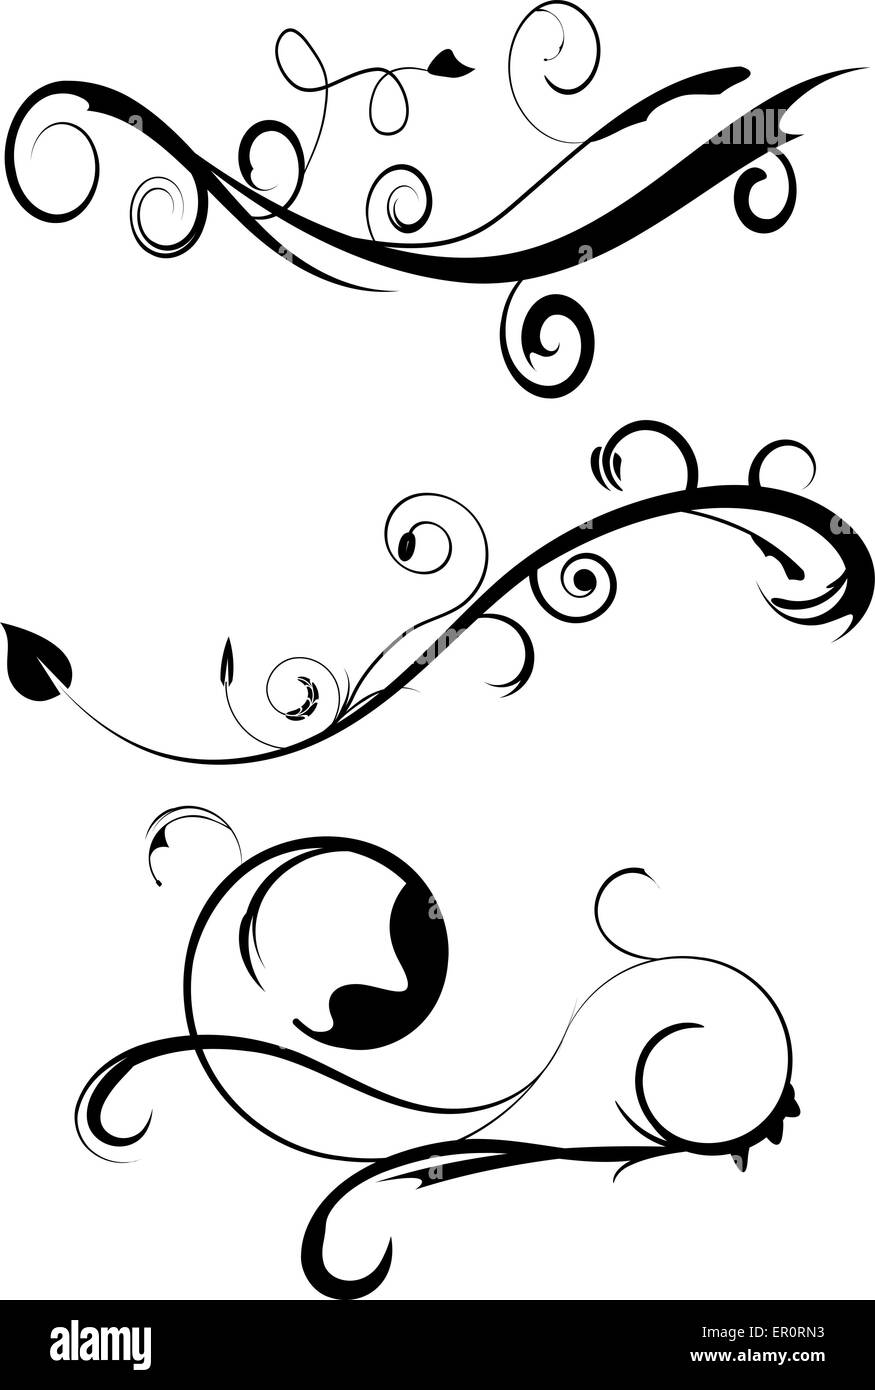 decorative flourishes set 3 stock vector art illustration vector ER Nurse Logo decorative flourishes set 3